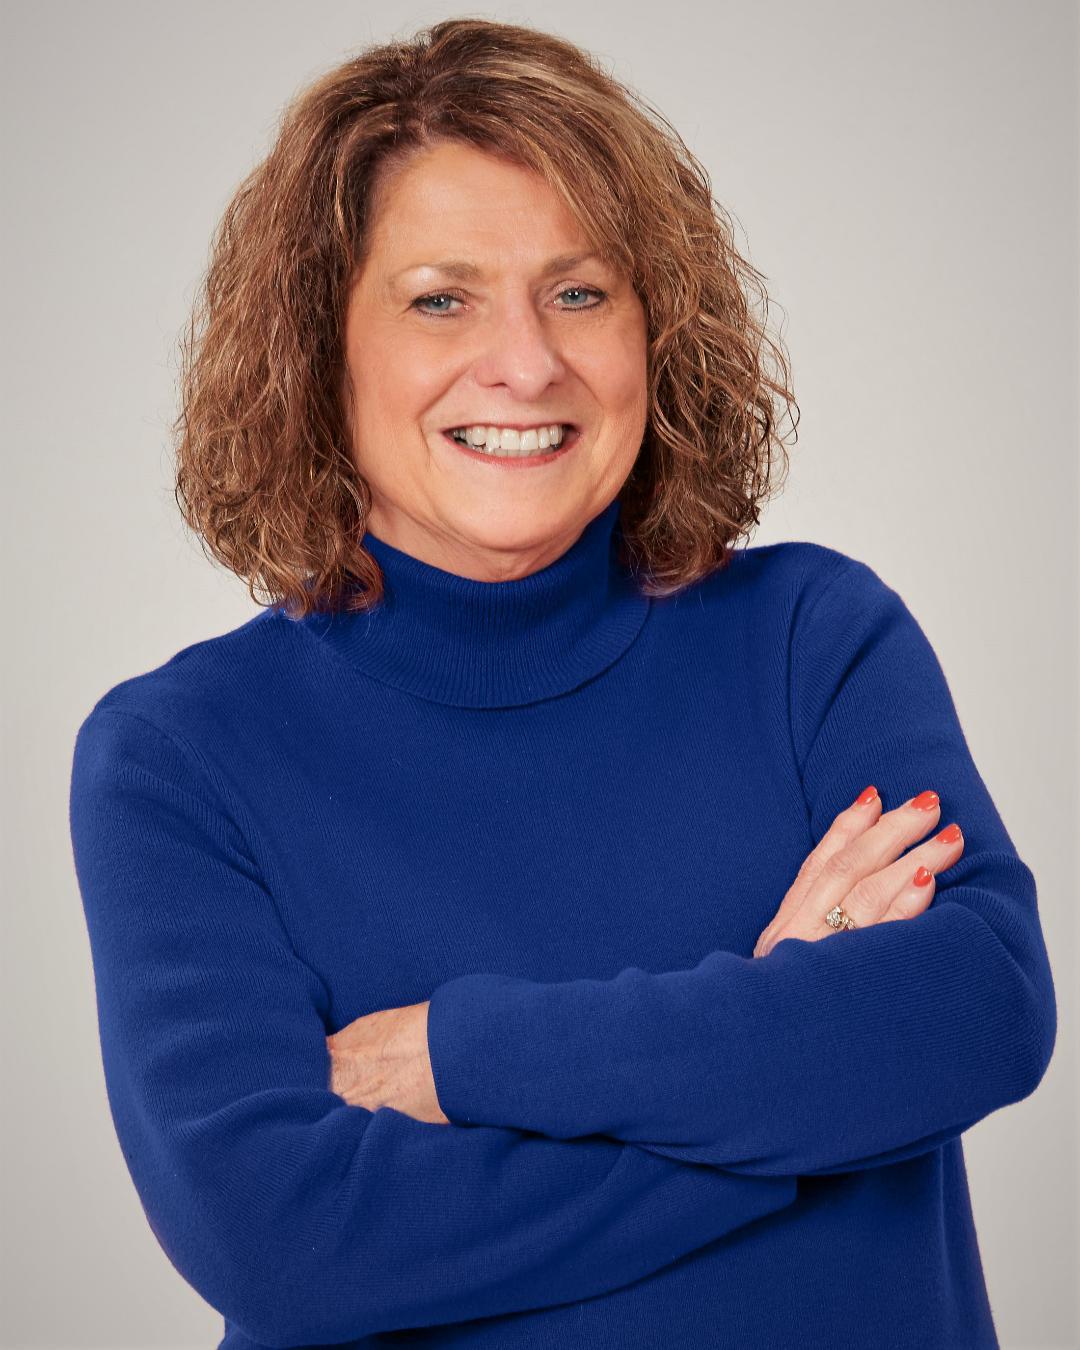 Angela D. Wilderman